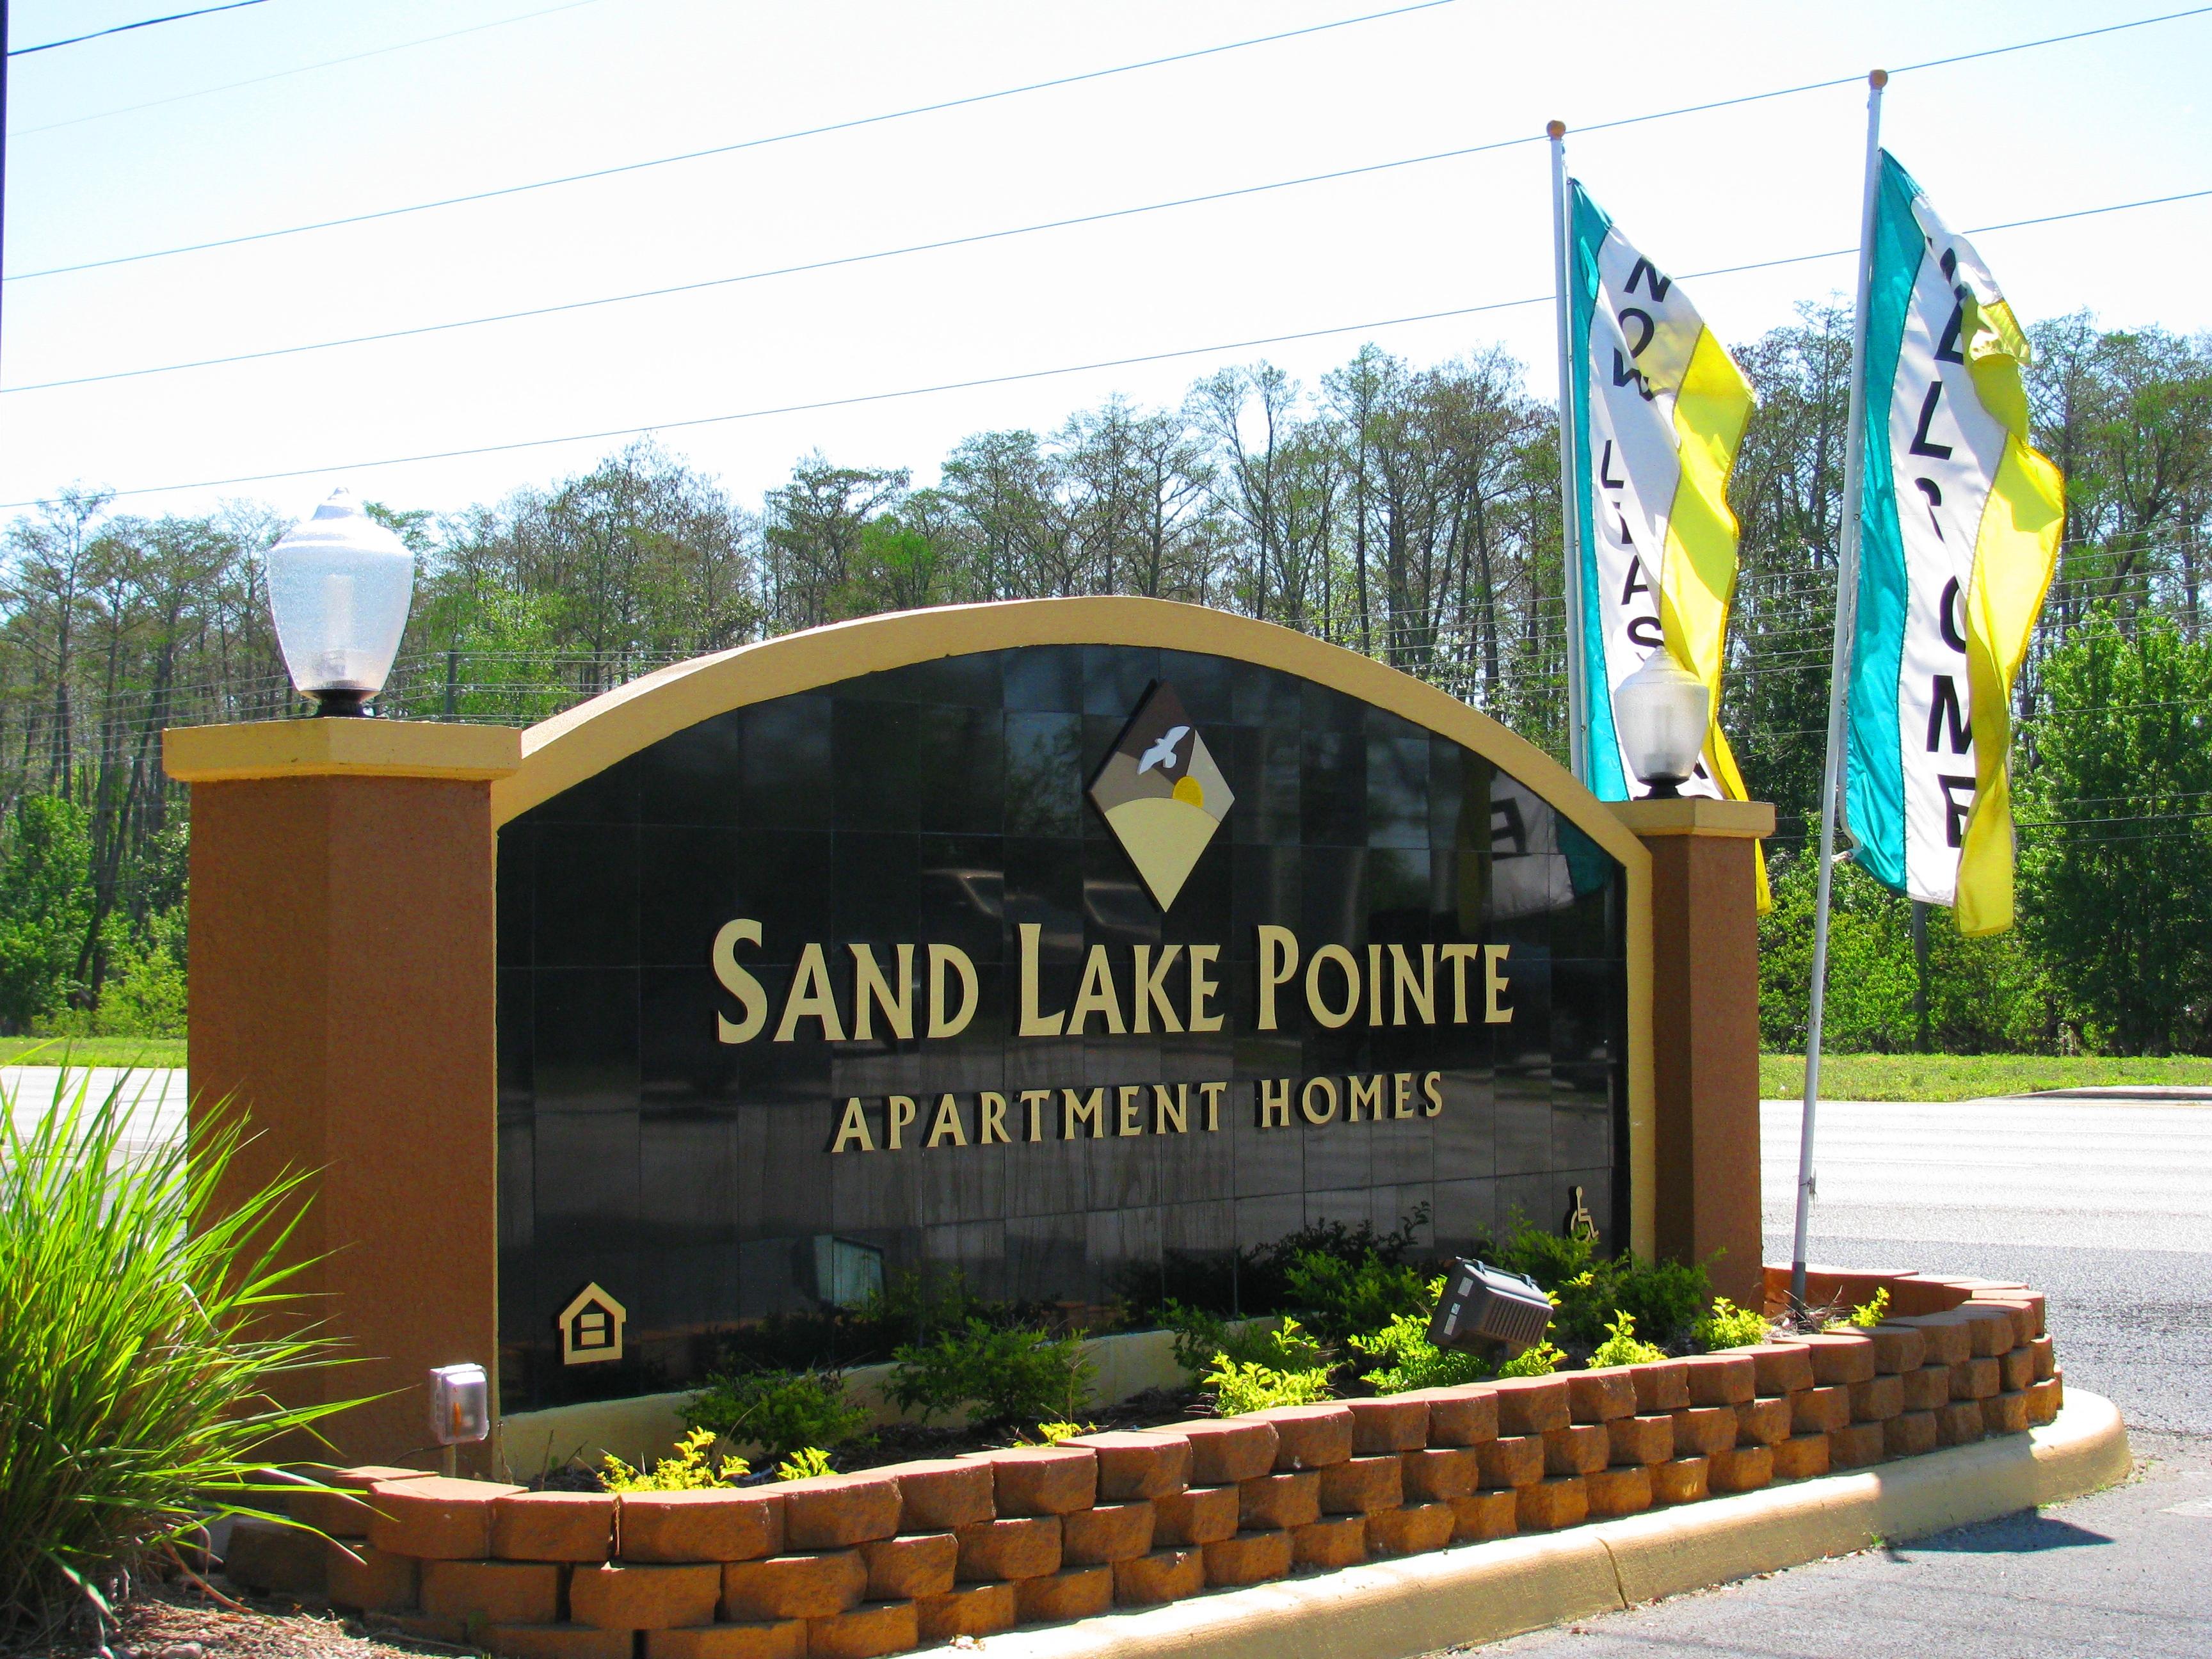 Sand Lake Pointe Apartments